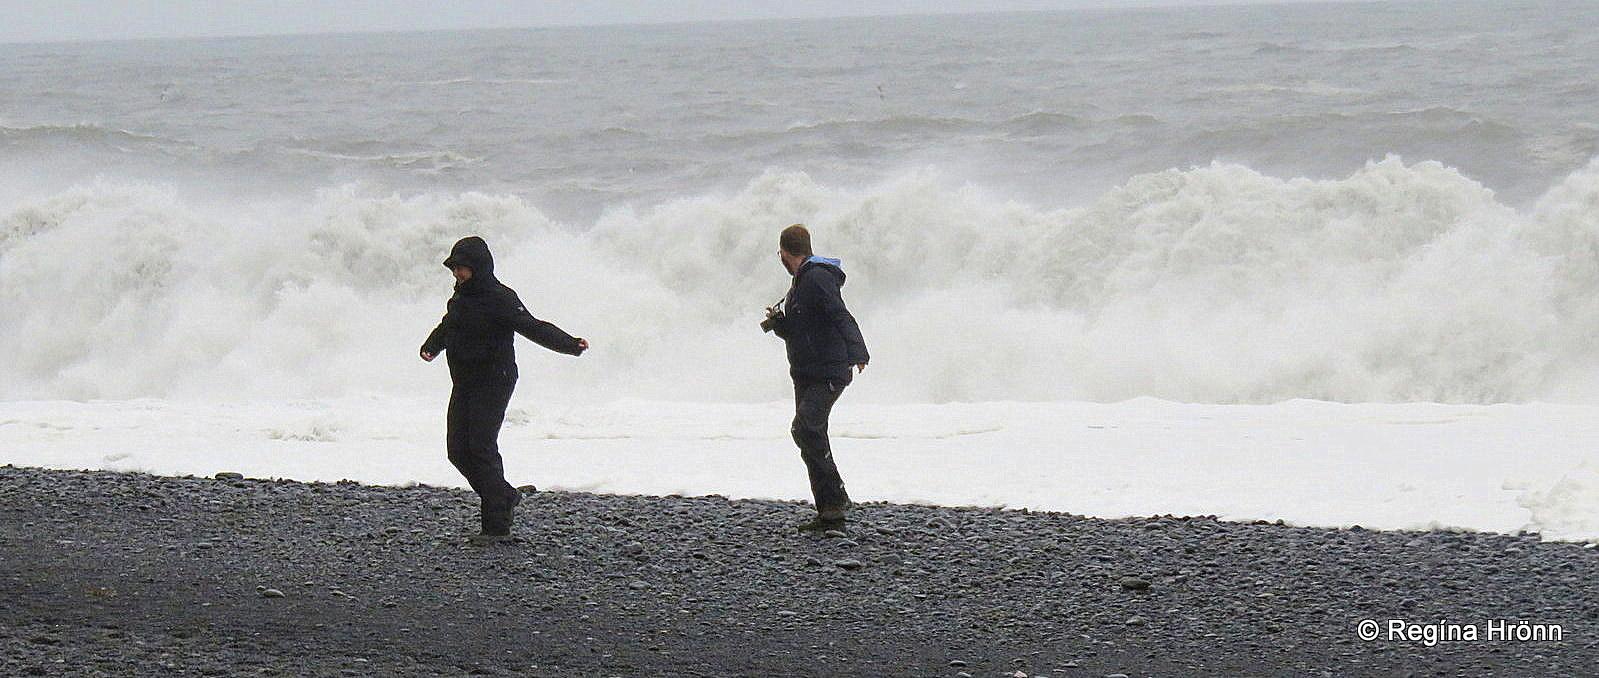 3d9672c6e Extremely dangerous Waves by Reynisfjara and Kirkjufjara black ...